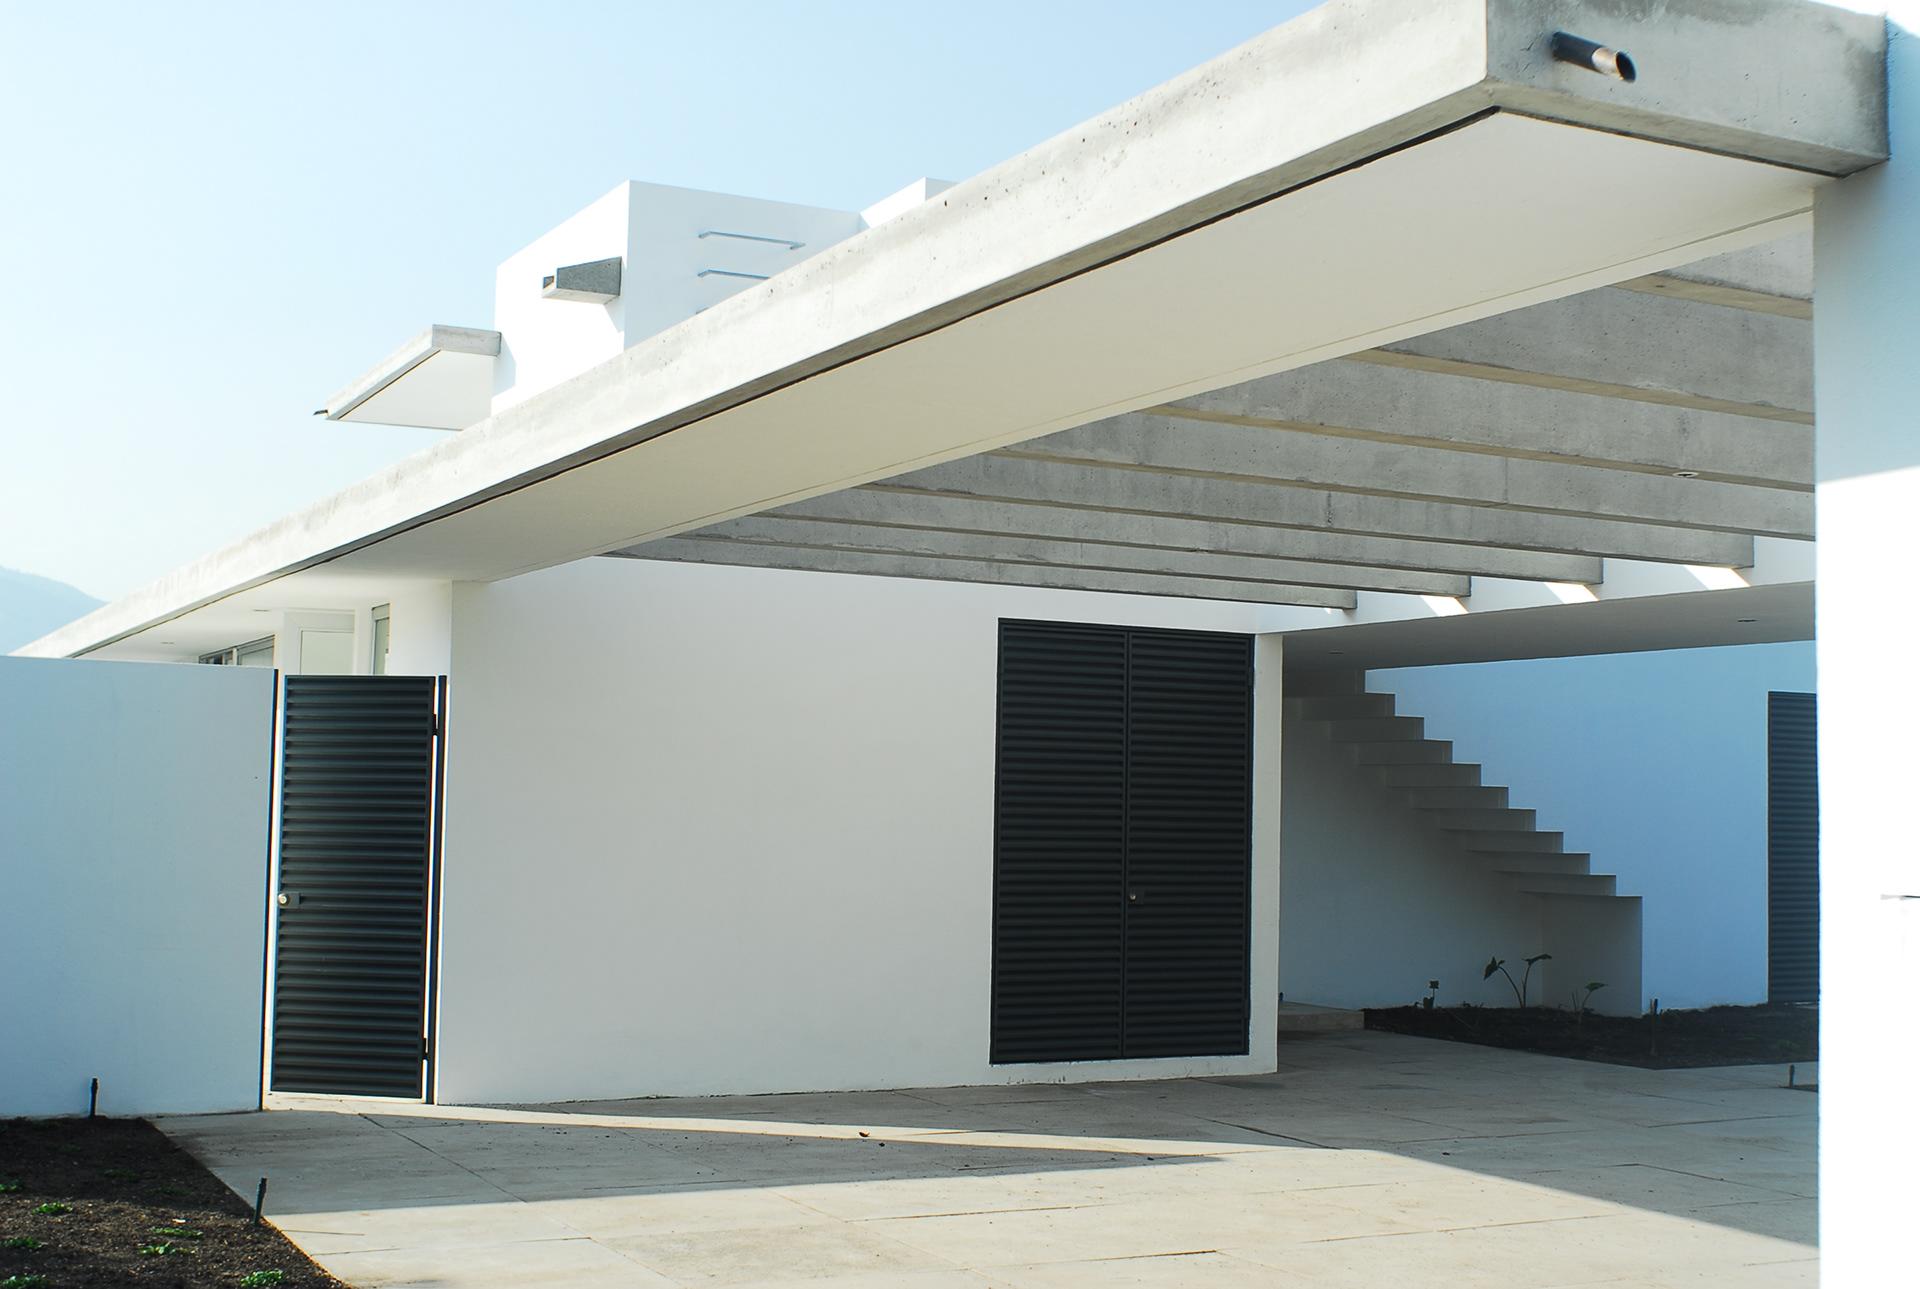 Osvaldo cardemil nautilus constructora casa lever for Constructora casa